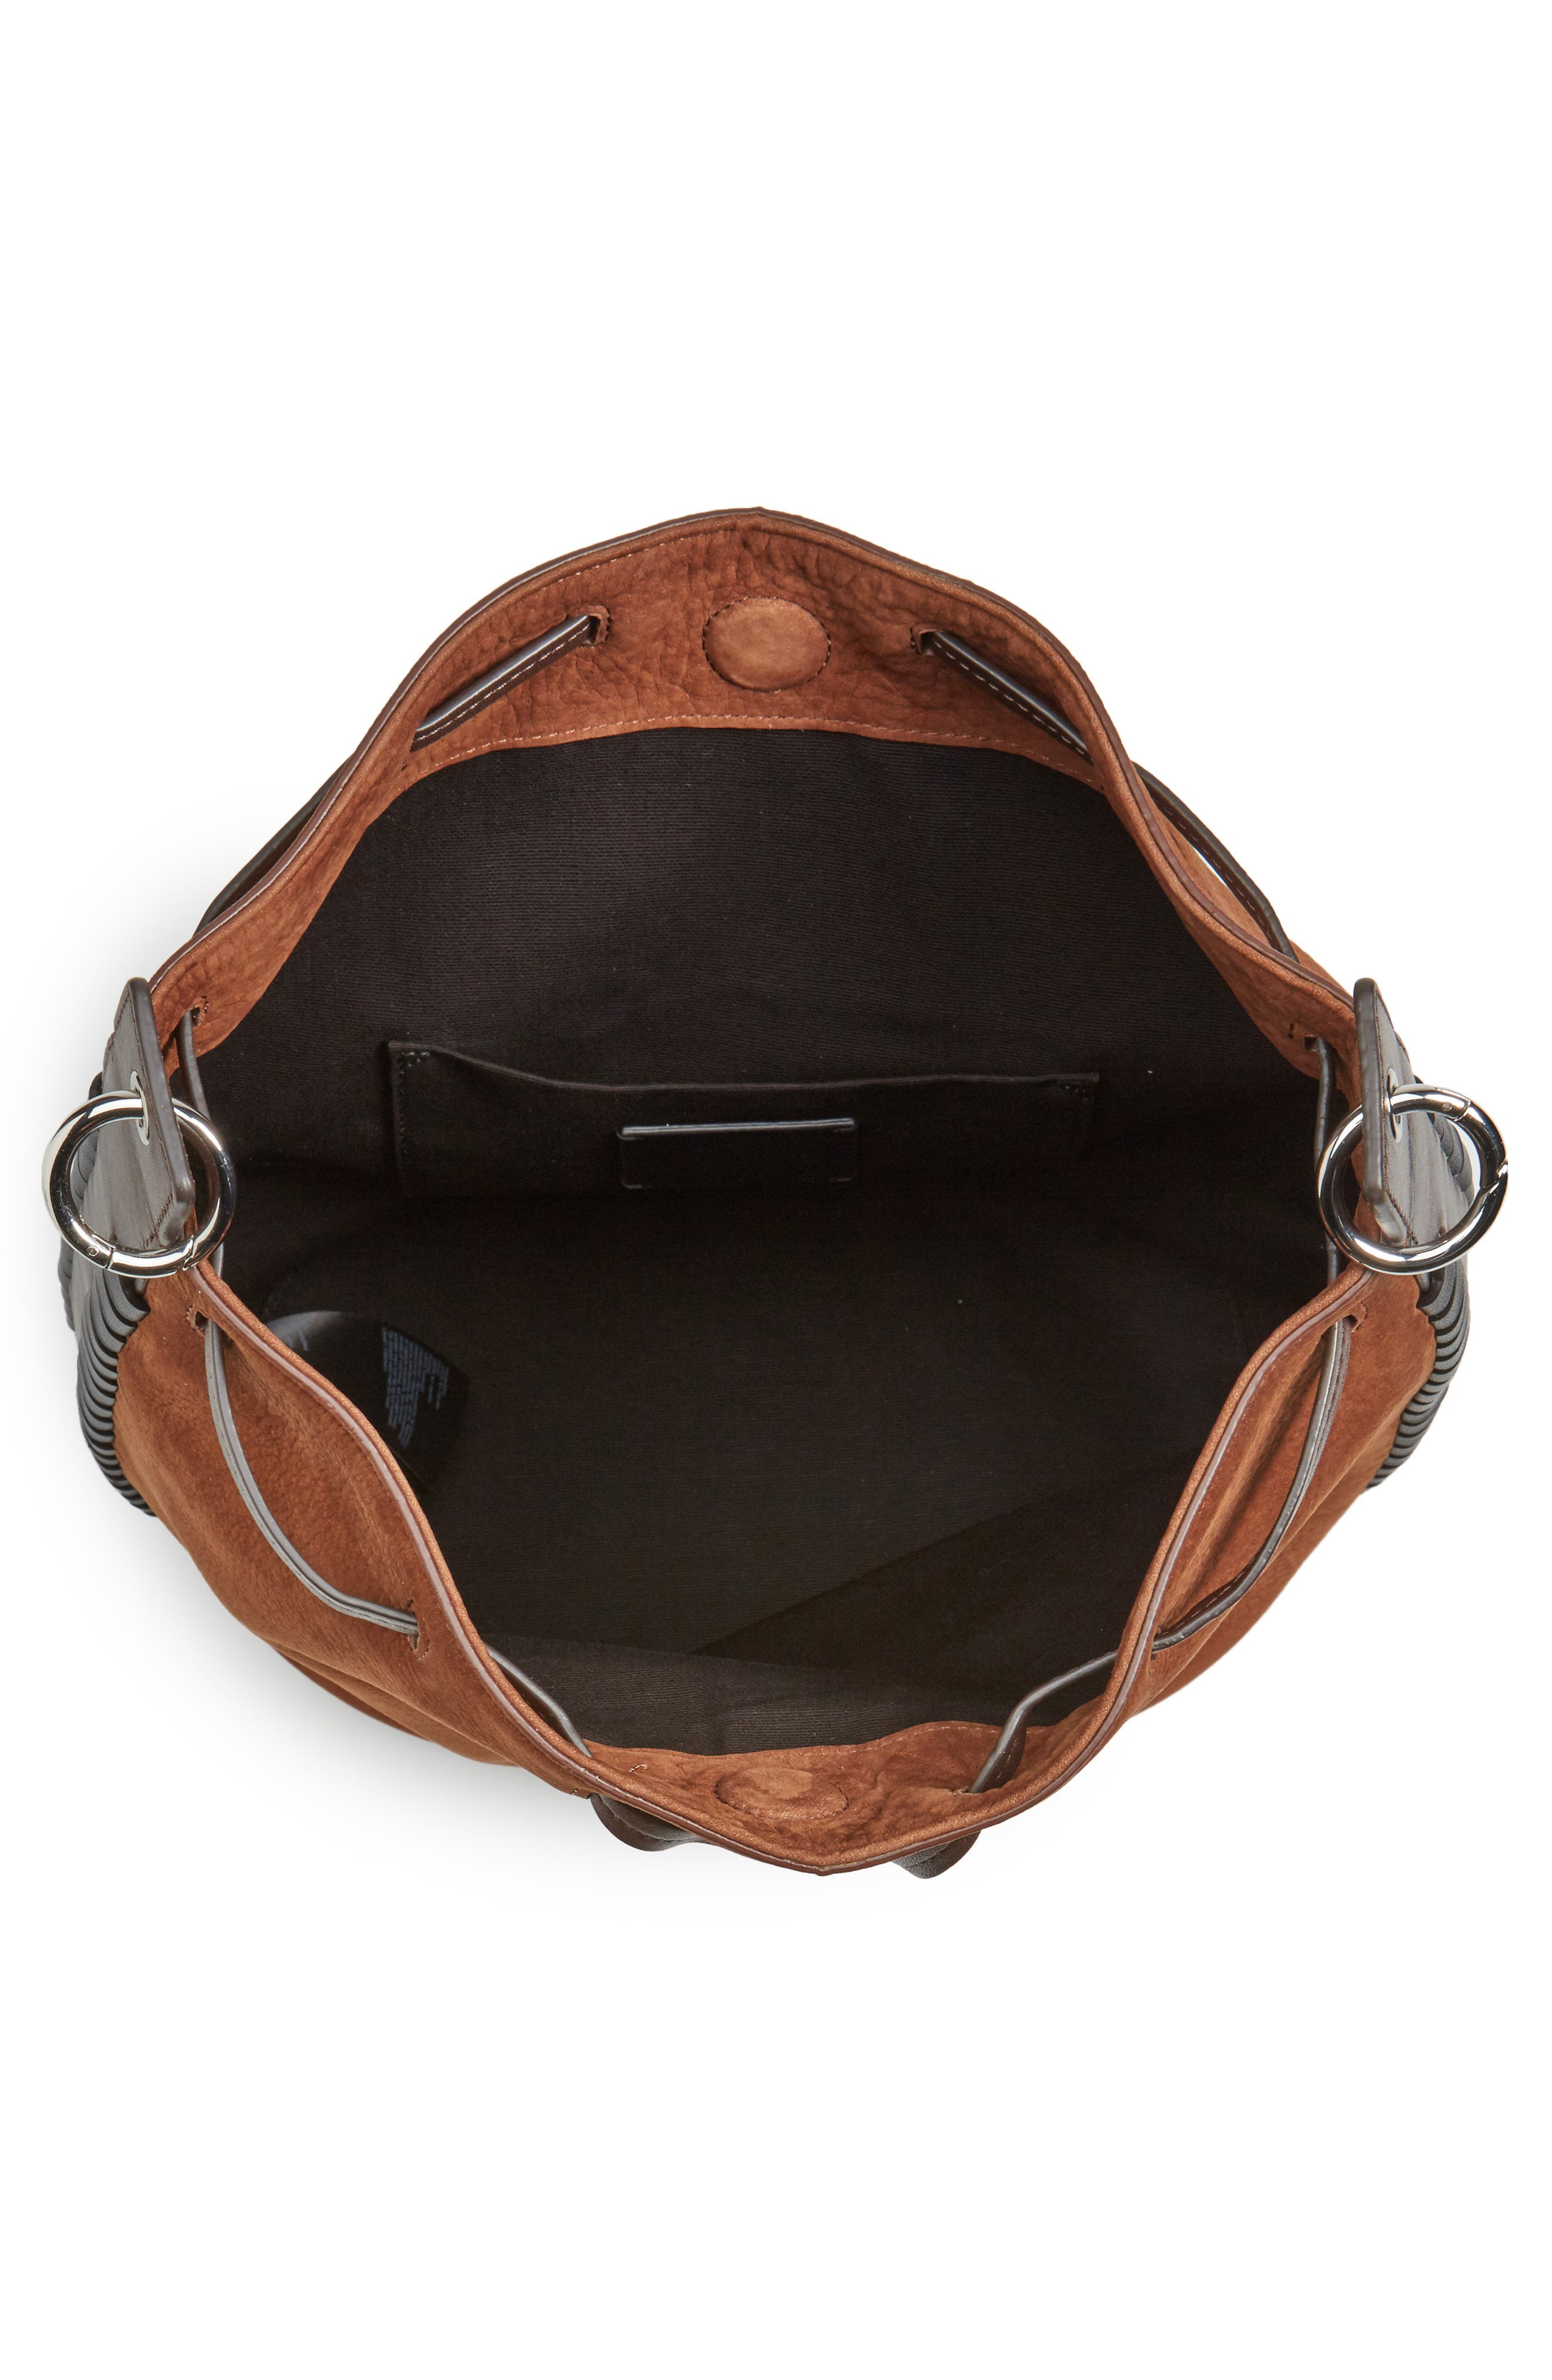 Ray Nubuck Leather Bucket Bag,                             Alternate thumbnail 4, color,                             200